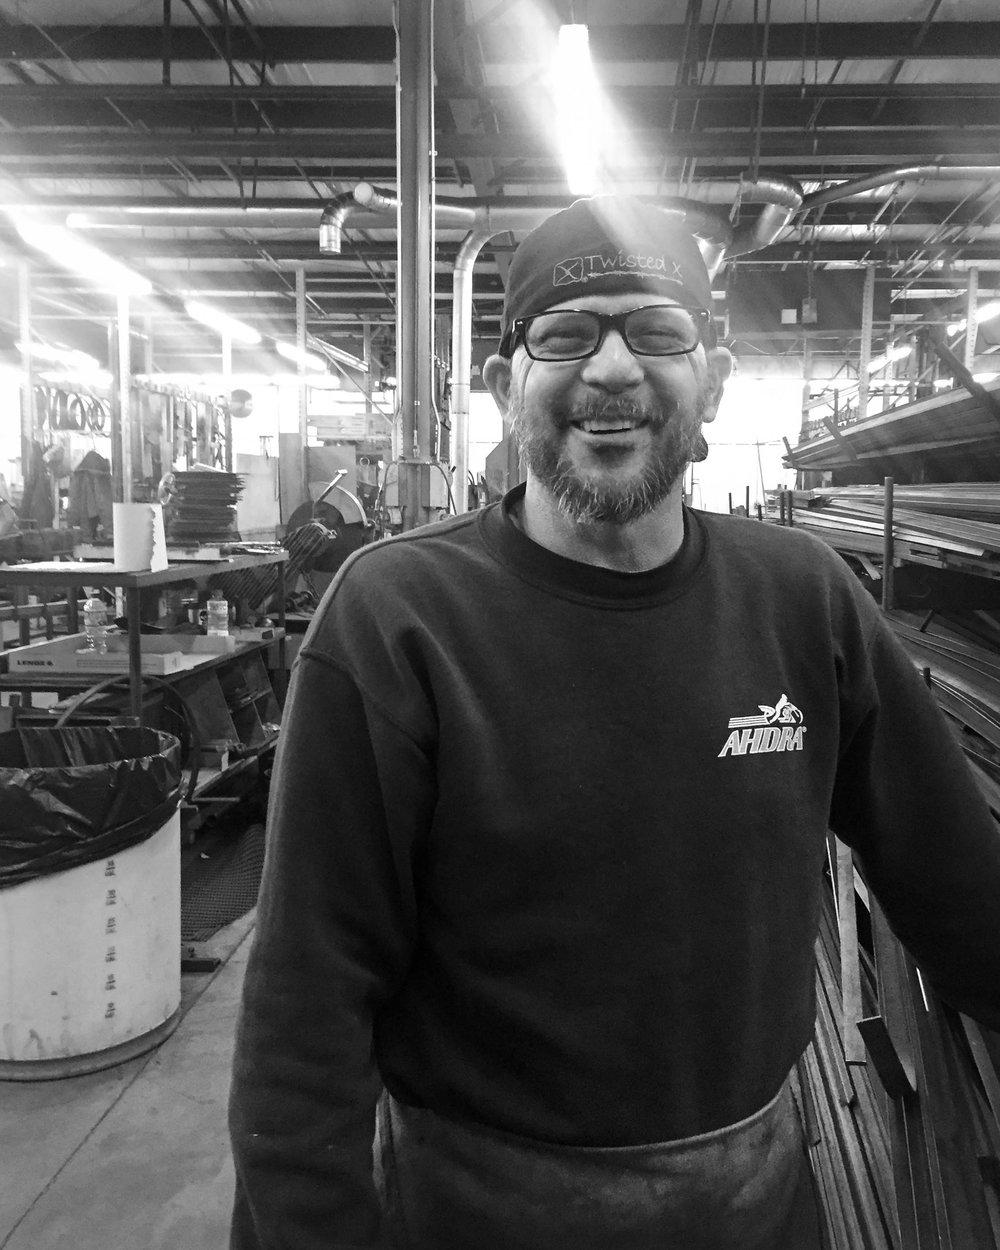 Metalworking artist, steel forger, custom furniture maker.